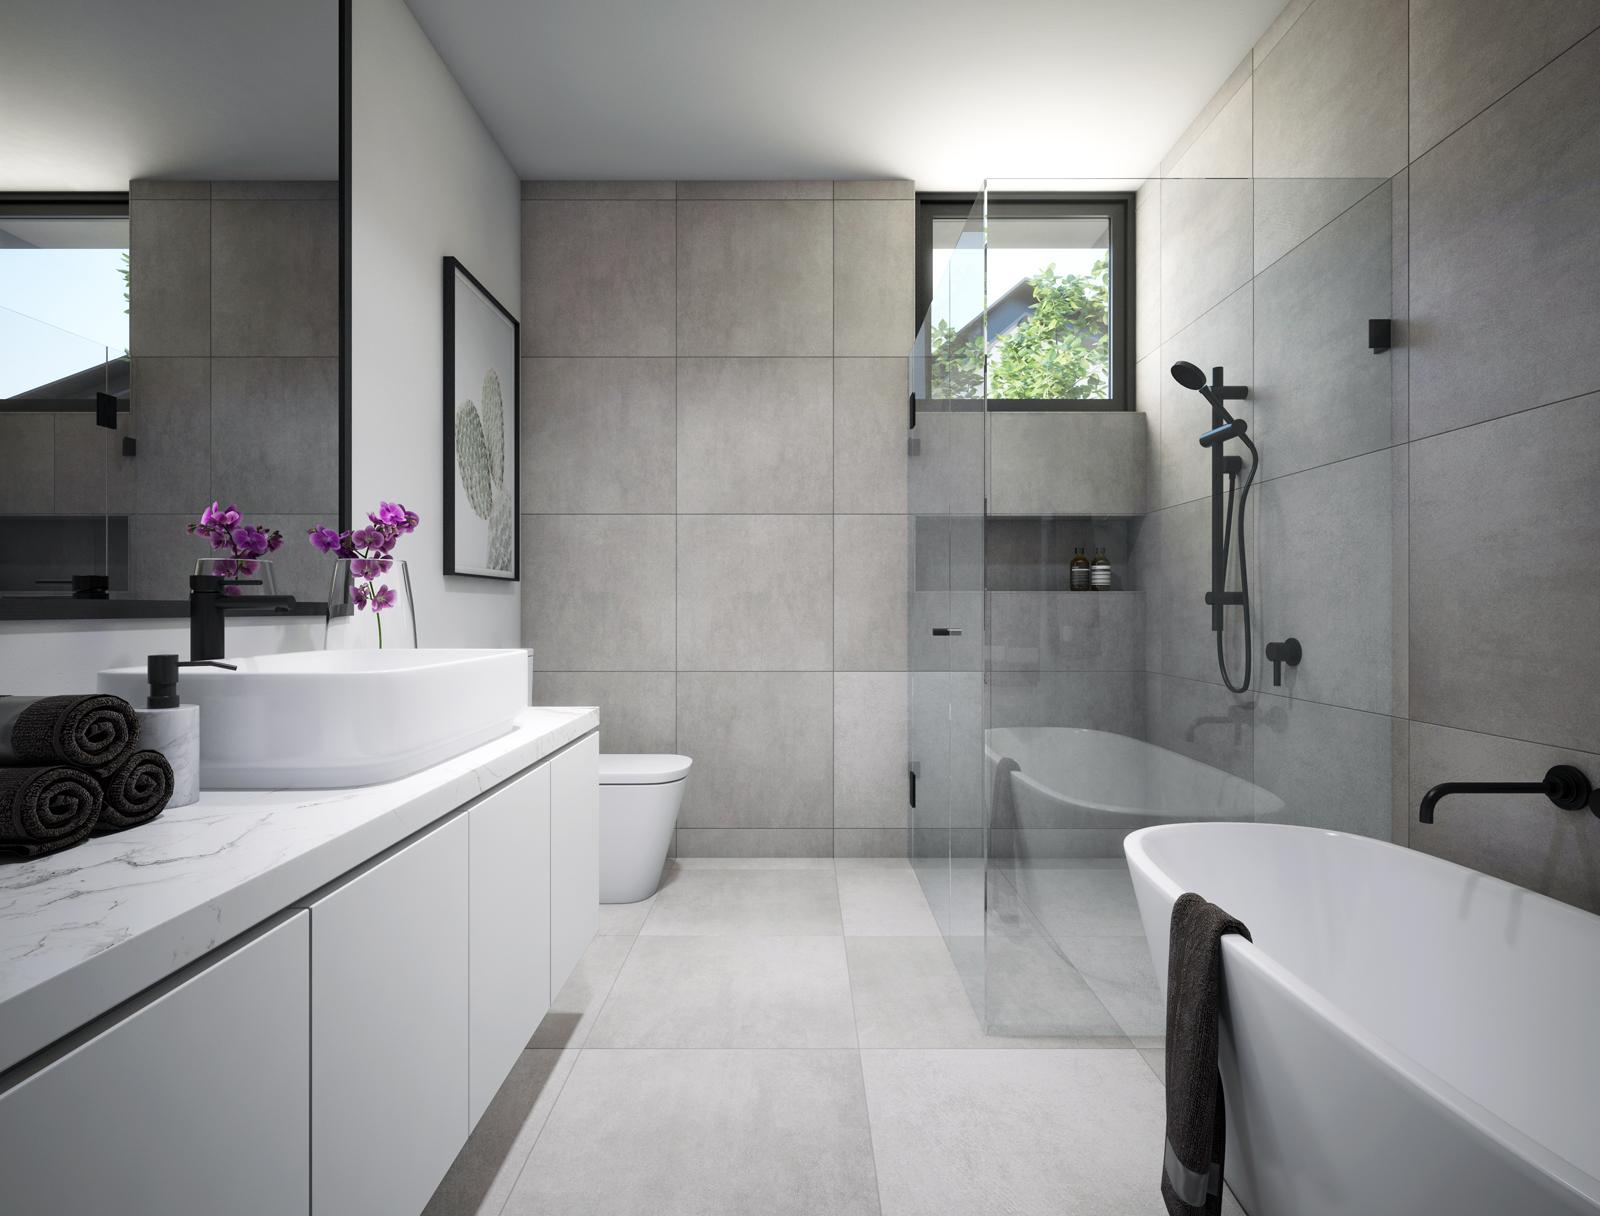 Santa Rosa Boulevard_Bathroom_Final Render.jpg